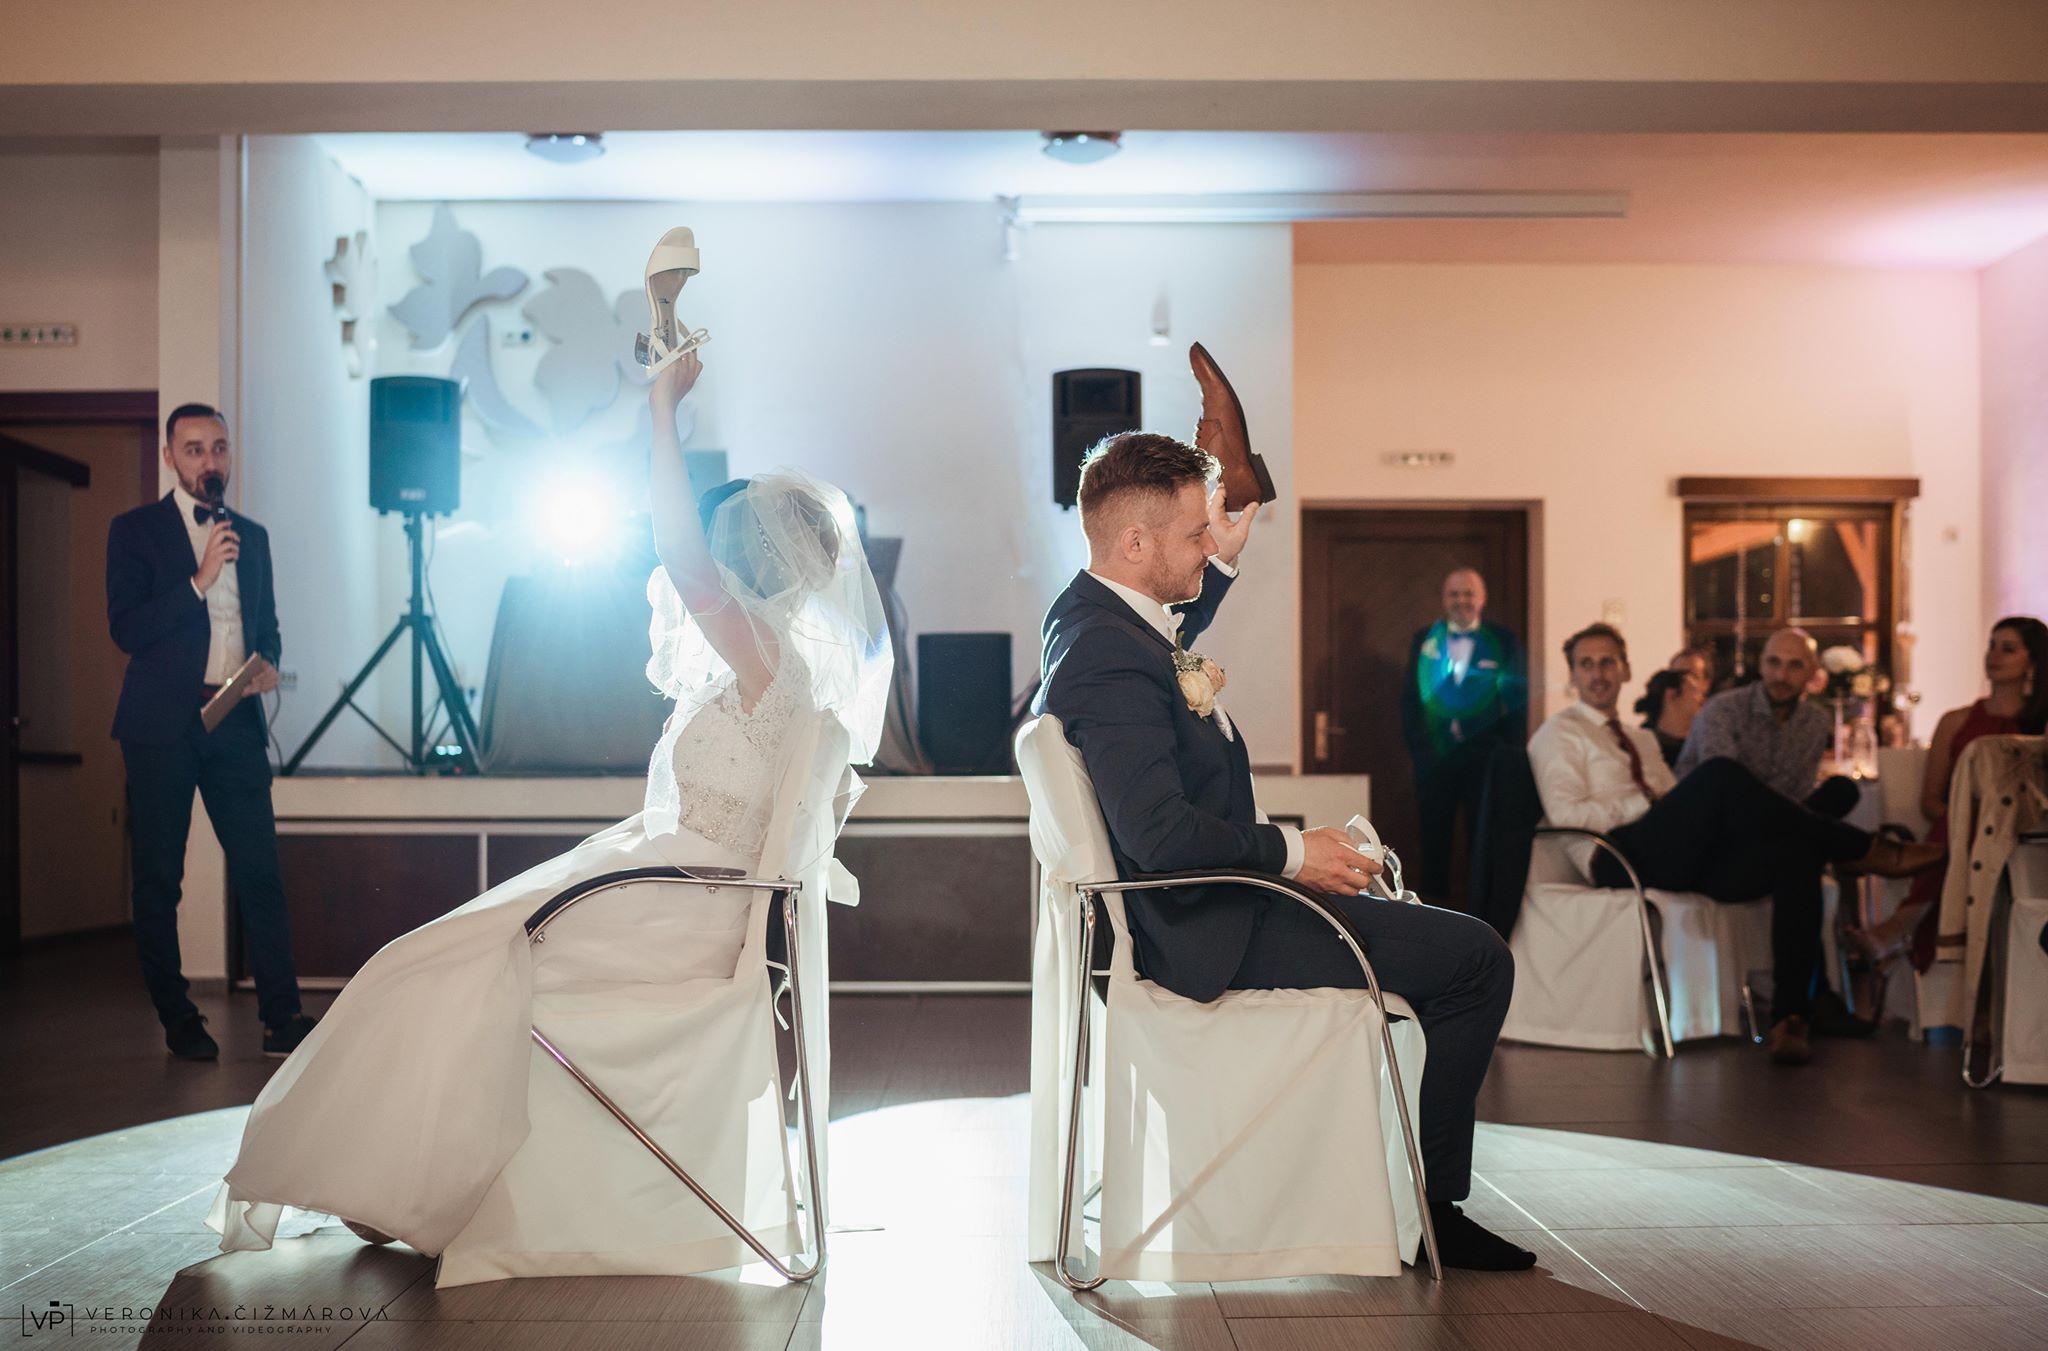 svadoba-hra-mladomantelsky-kvizjpg